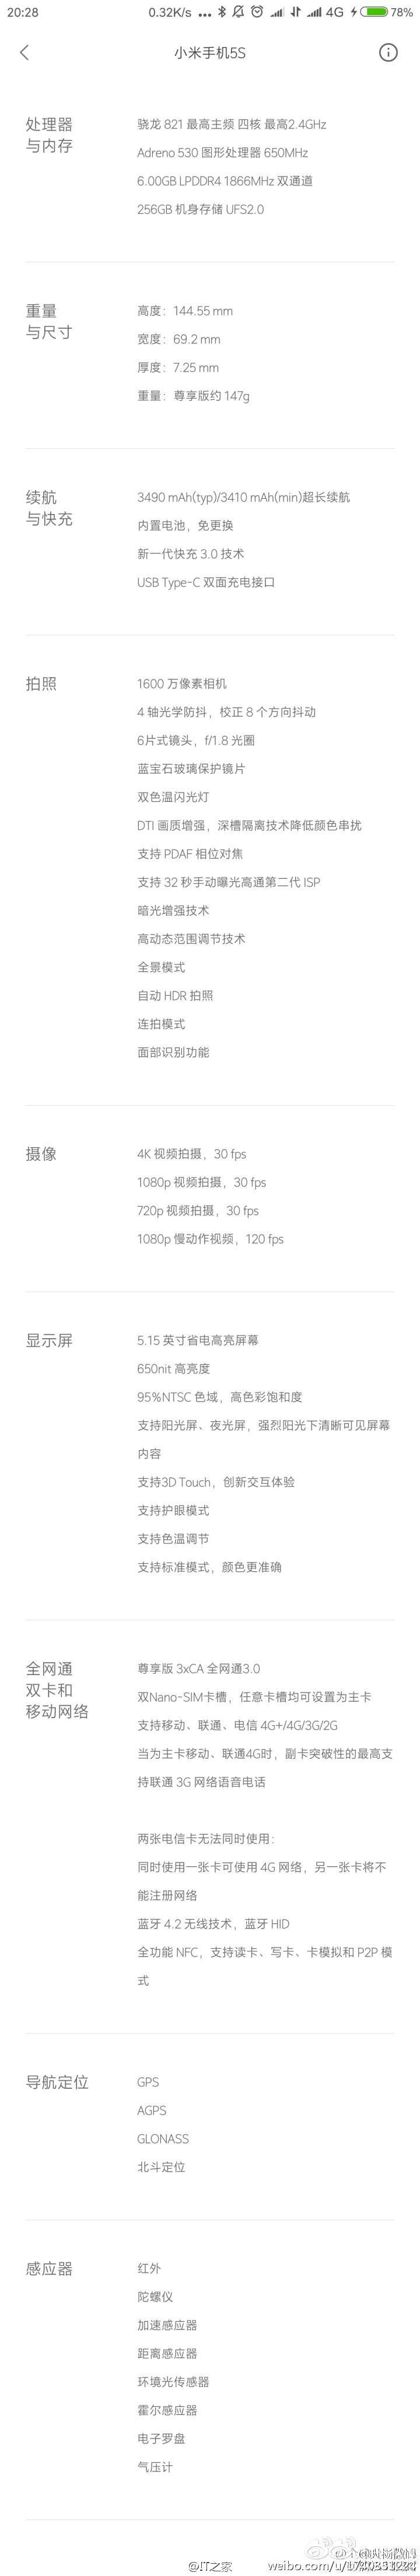 xiaomi-mi-5s-spec-sheet